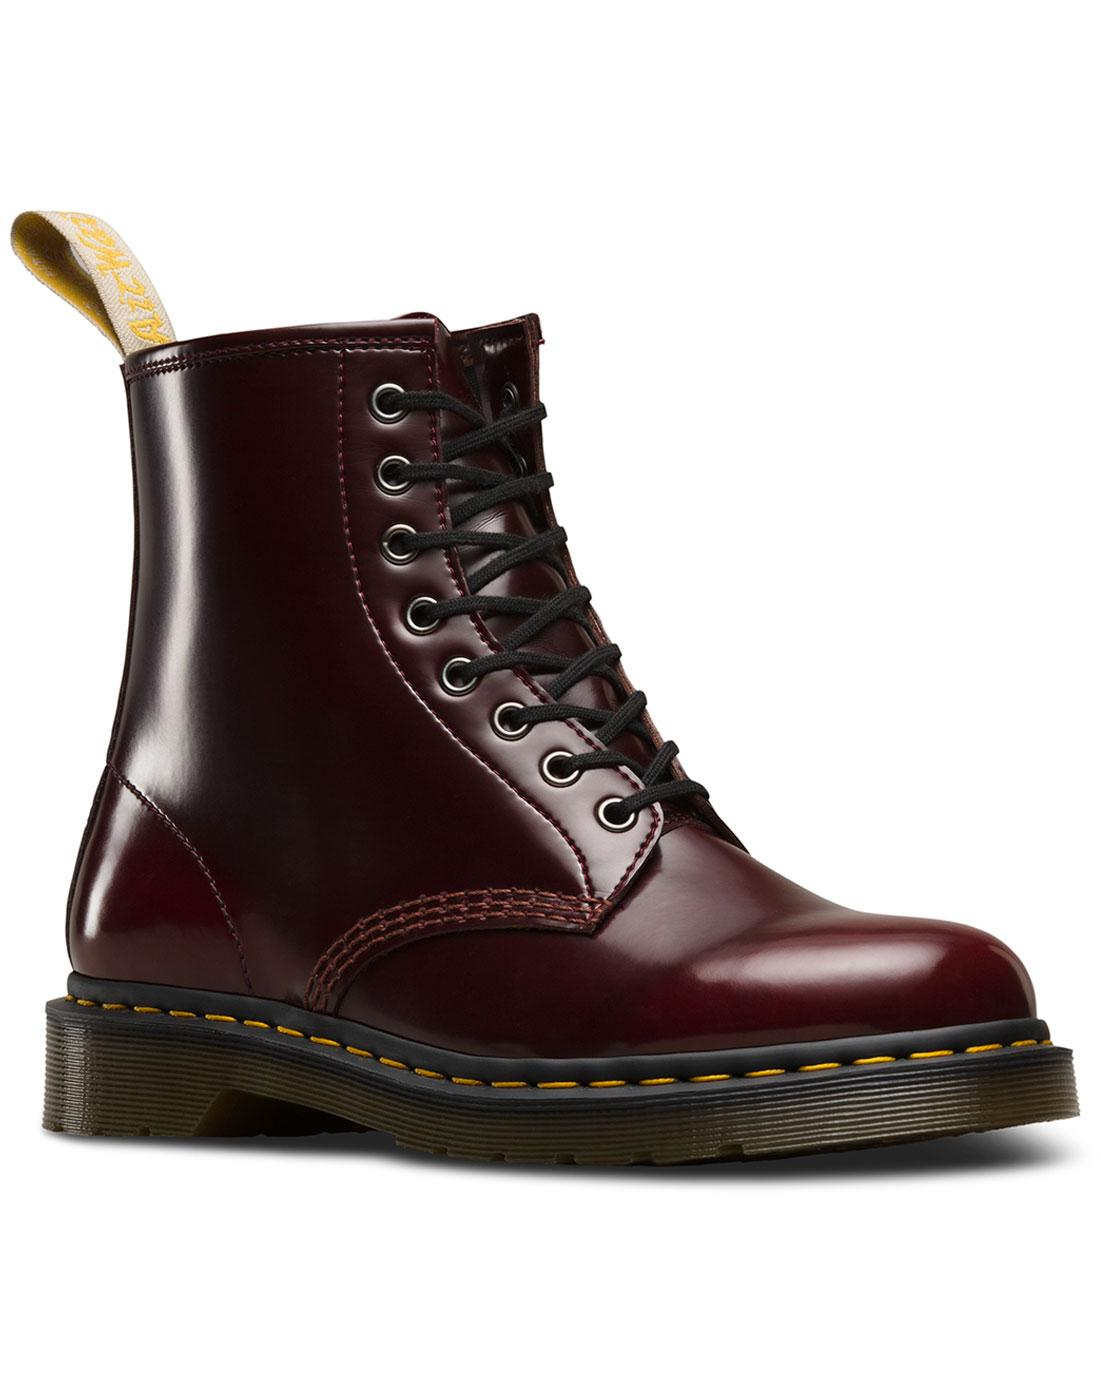 1460 Oxford Brush Vegan DR MARTENS Retro Boots